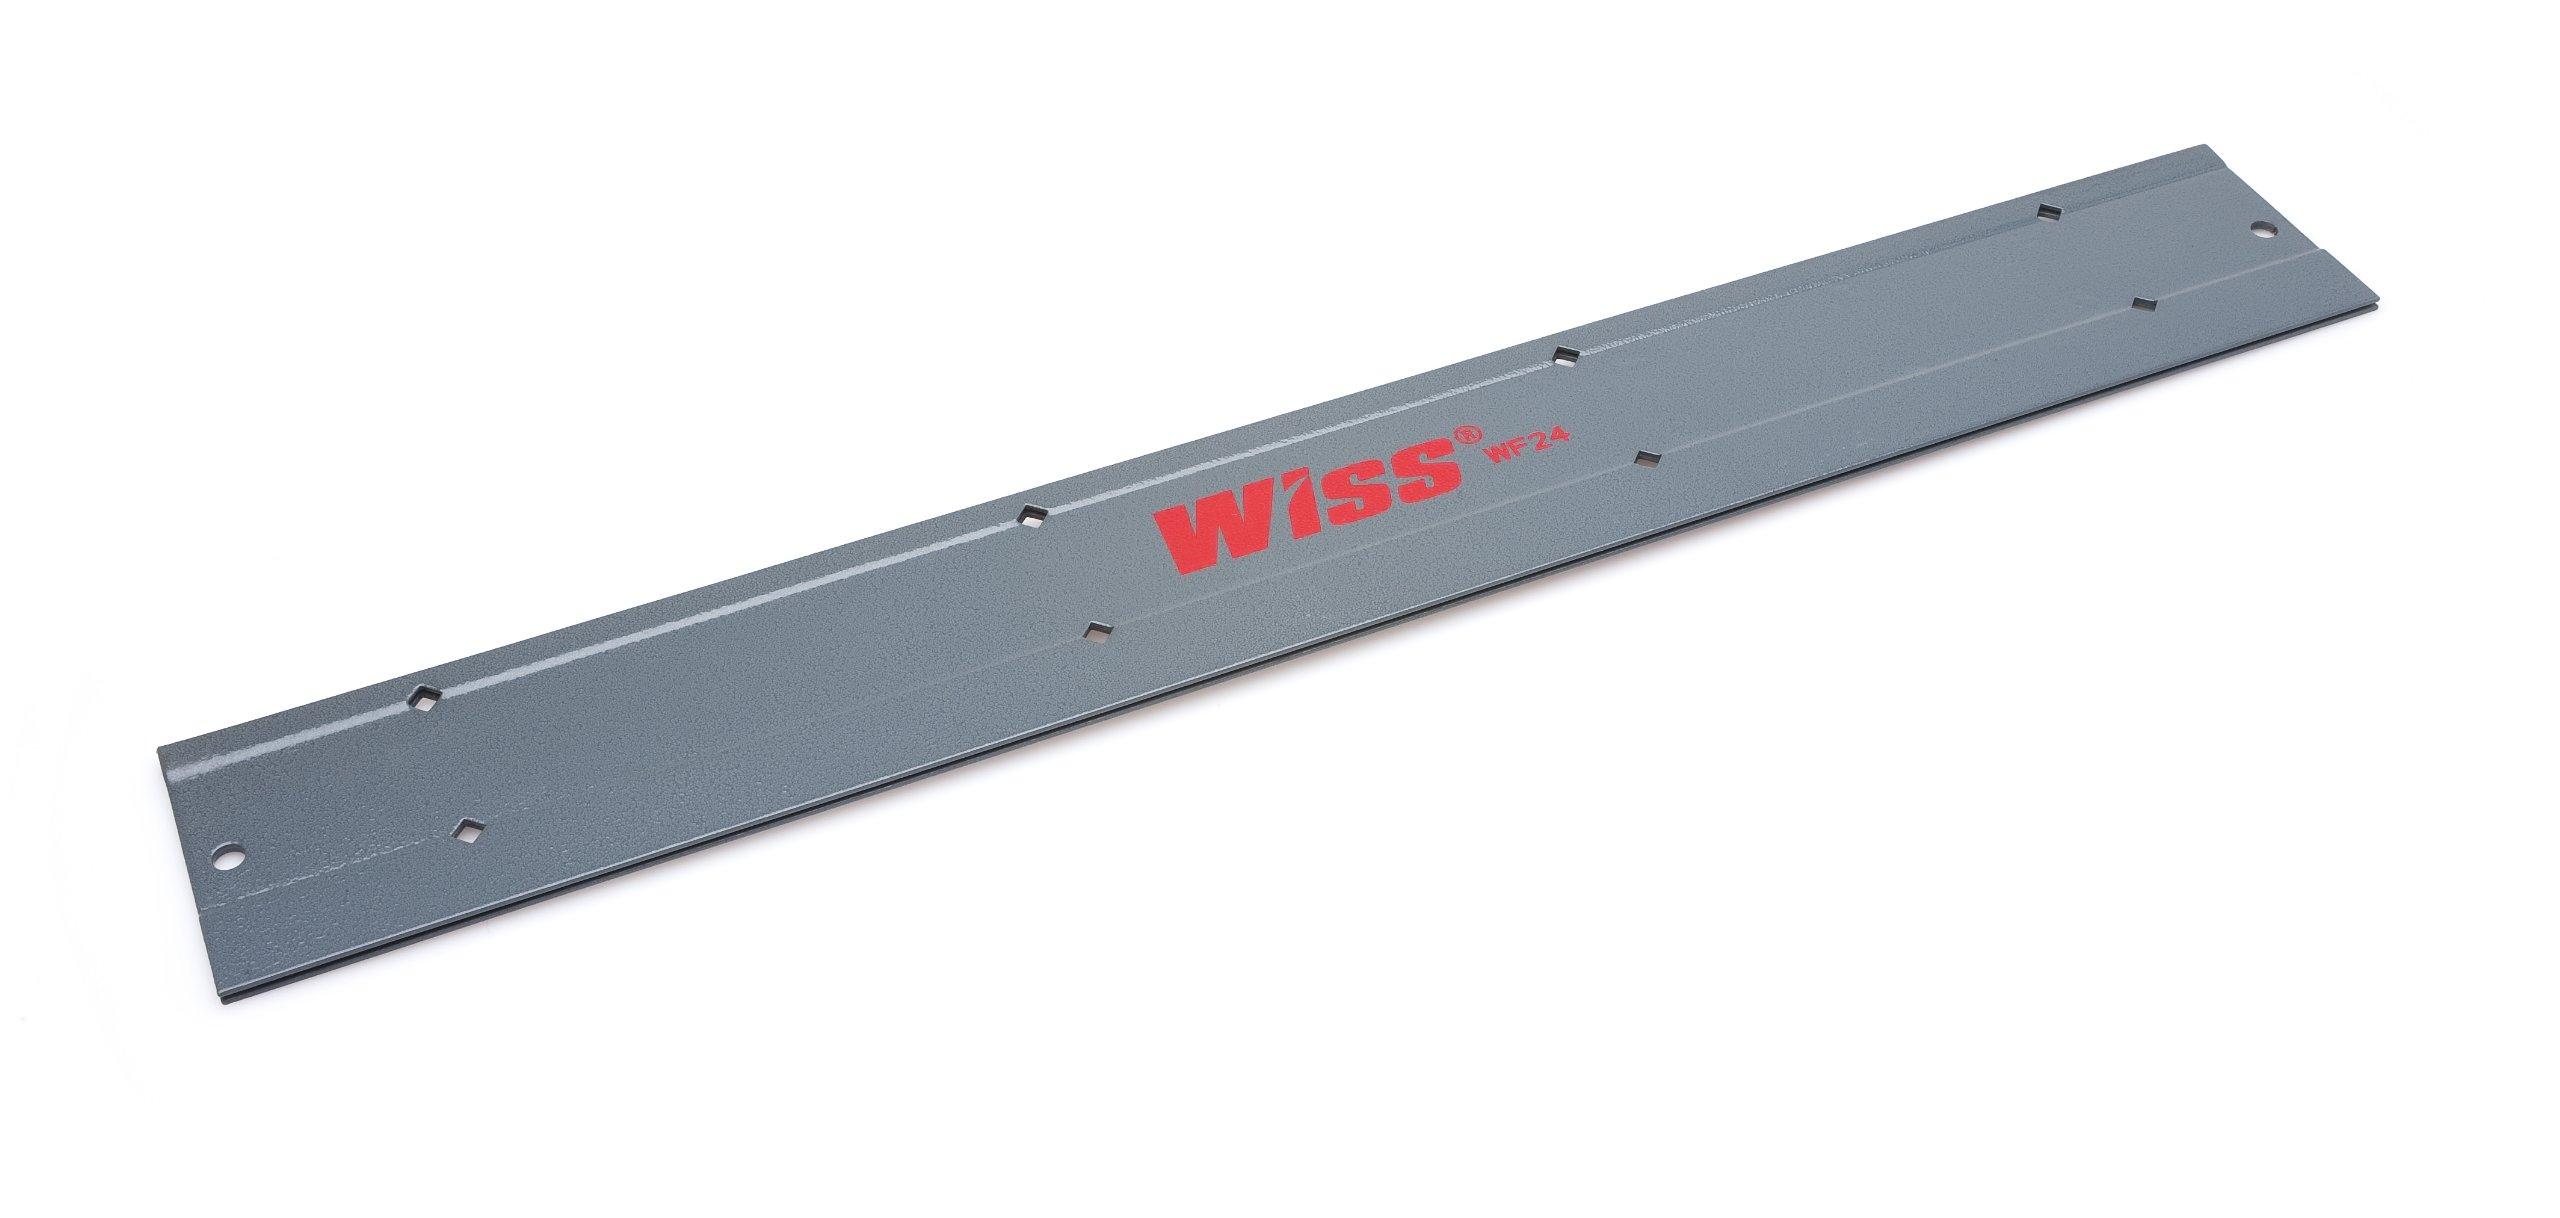 Apex Tool Group WF24 Wiss 24-Inch - HVAC Metal Folding Tool